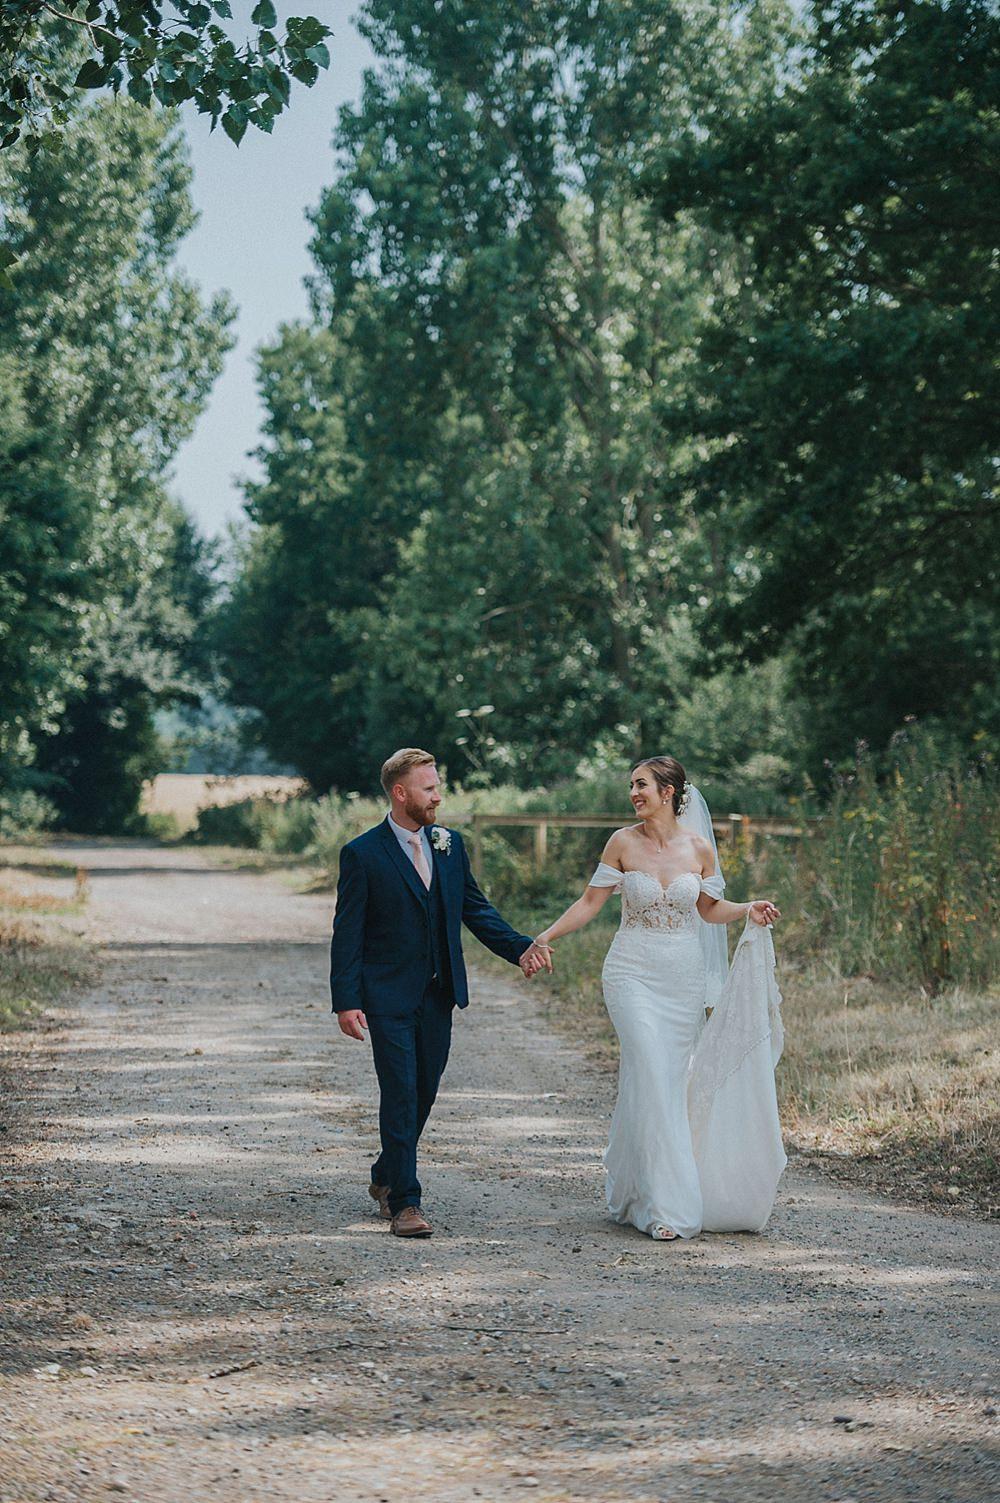 Houchins Farm Wedding Julia and You Photography